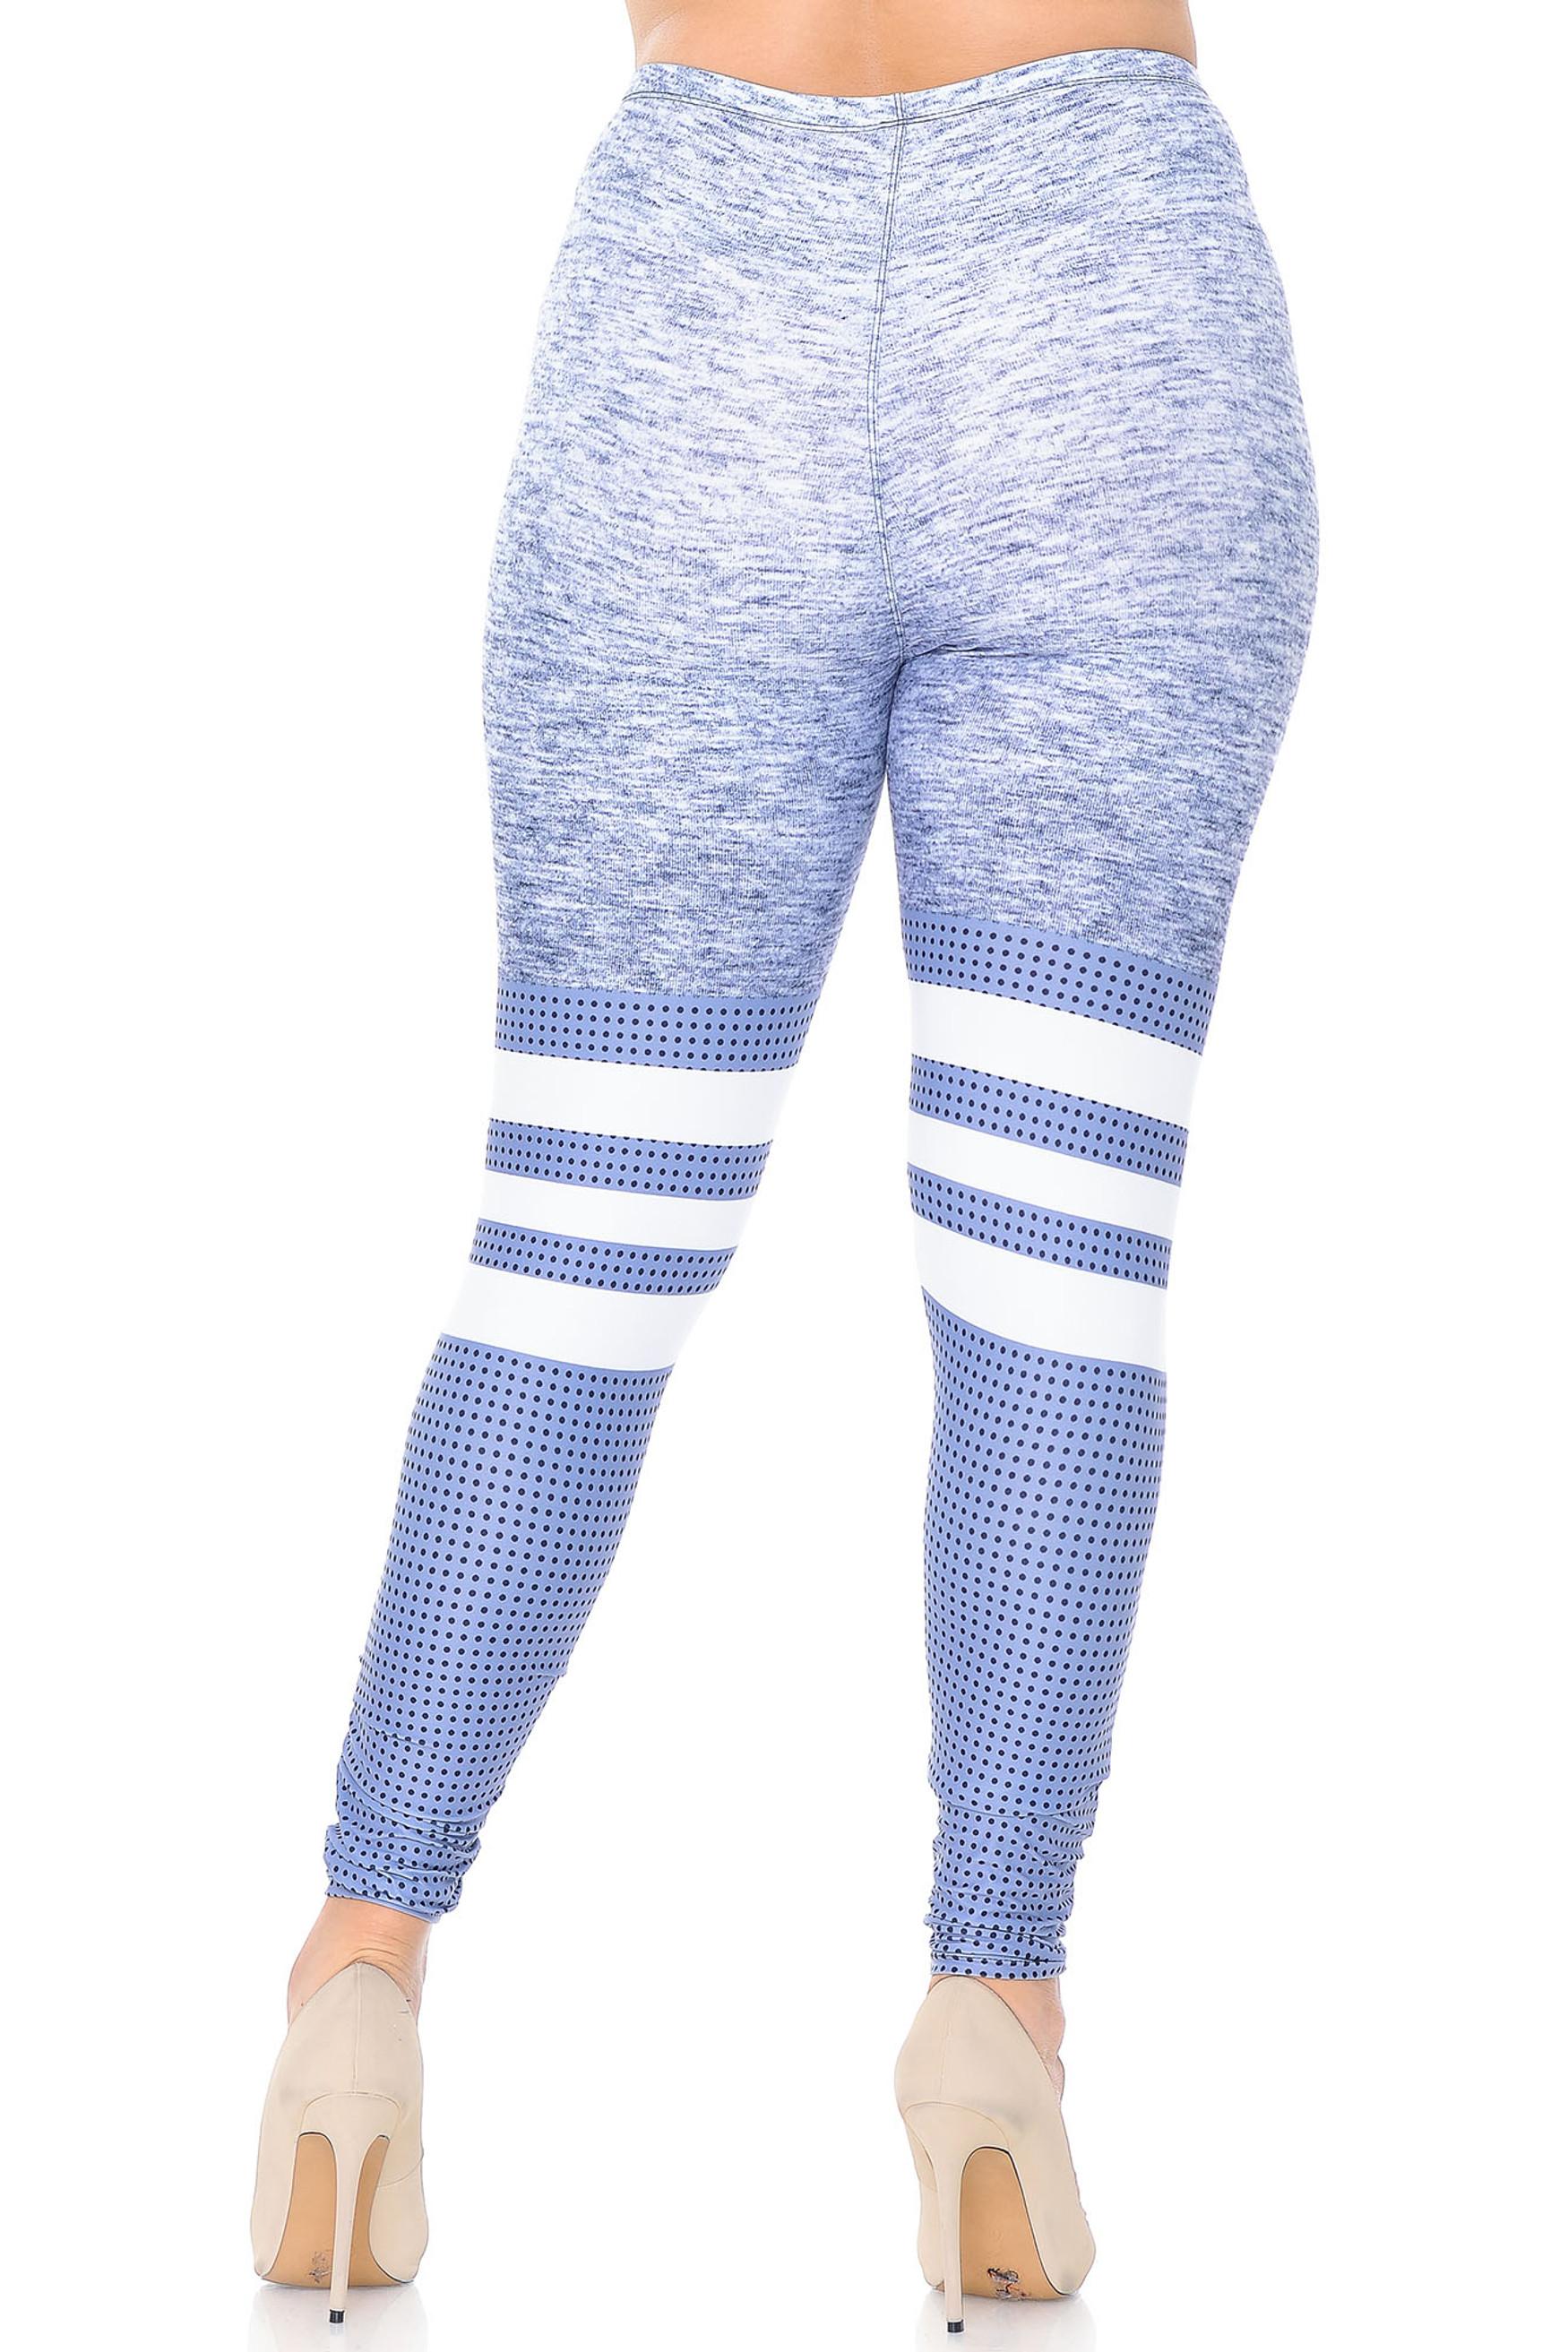 Creamy Soft Split Sport Light Heathered Plus Size Leggings - USA Fashion™